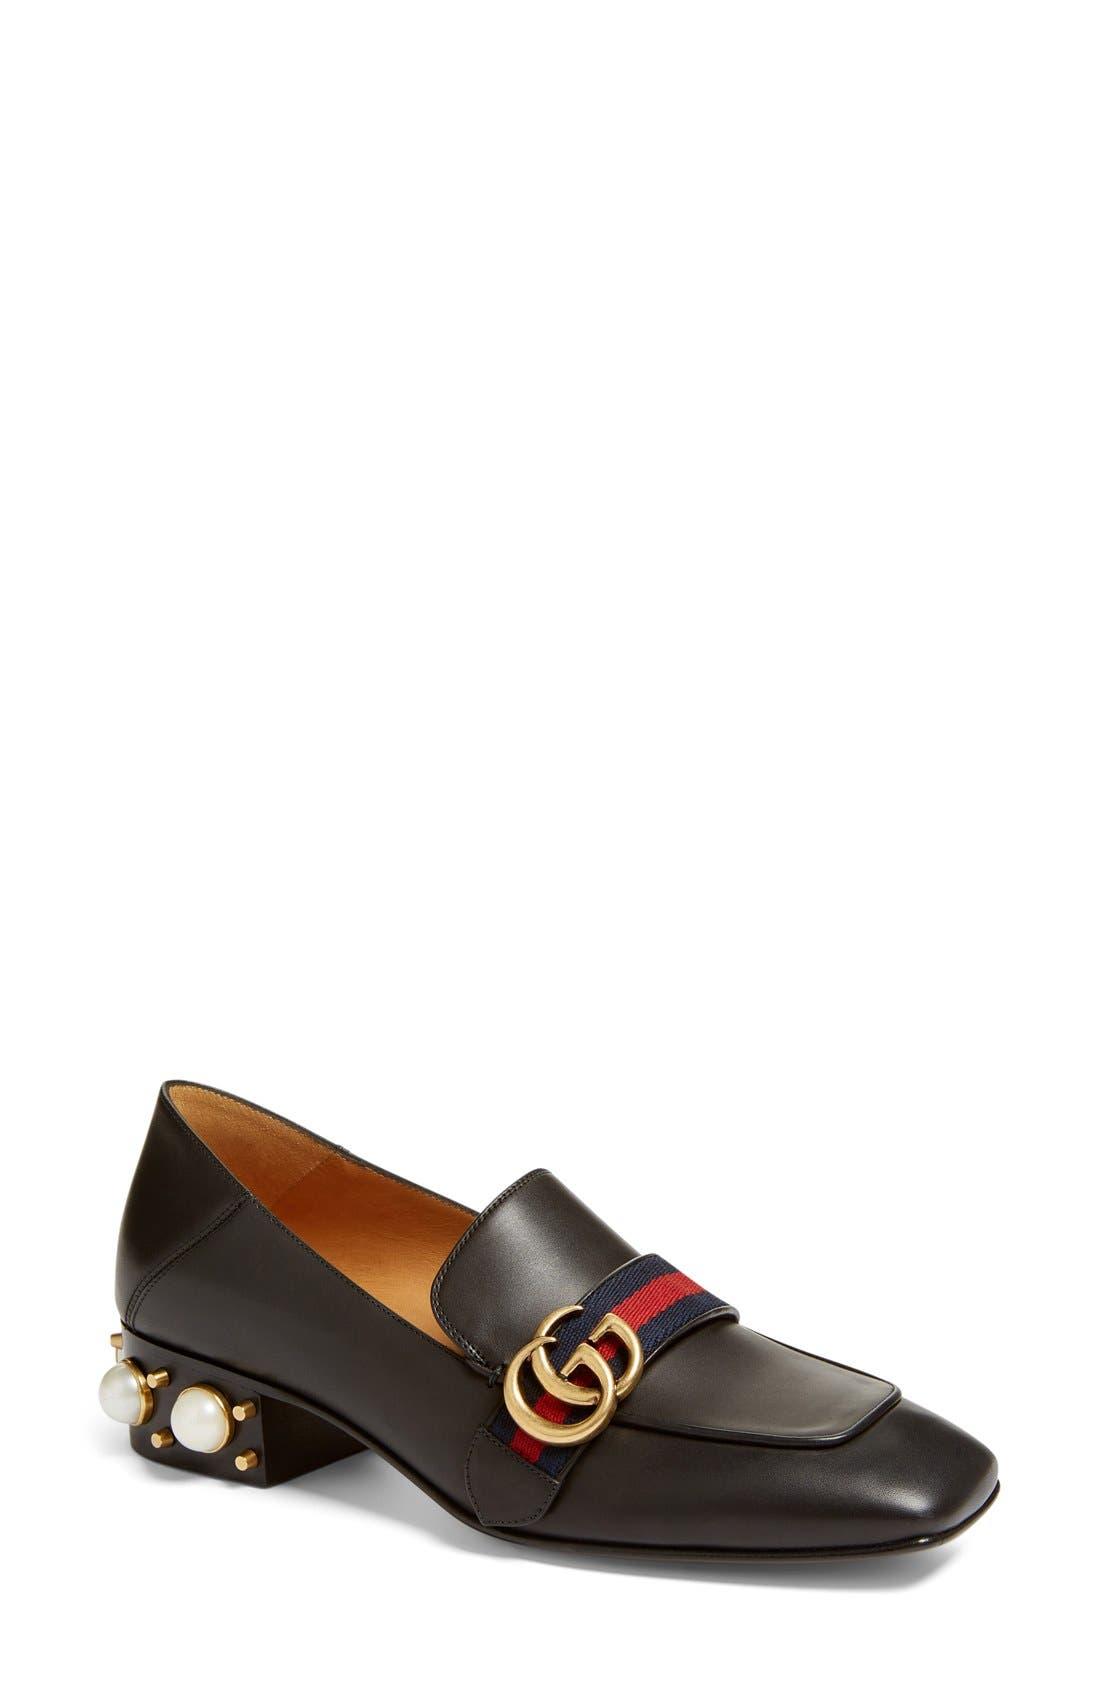 Alternate Image 1 Selected - Gucci Peyton Embellished Heel Loafer (Women)